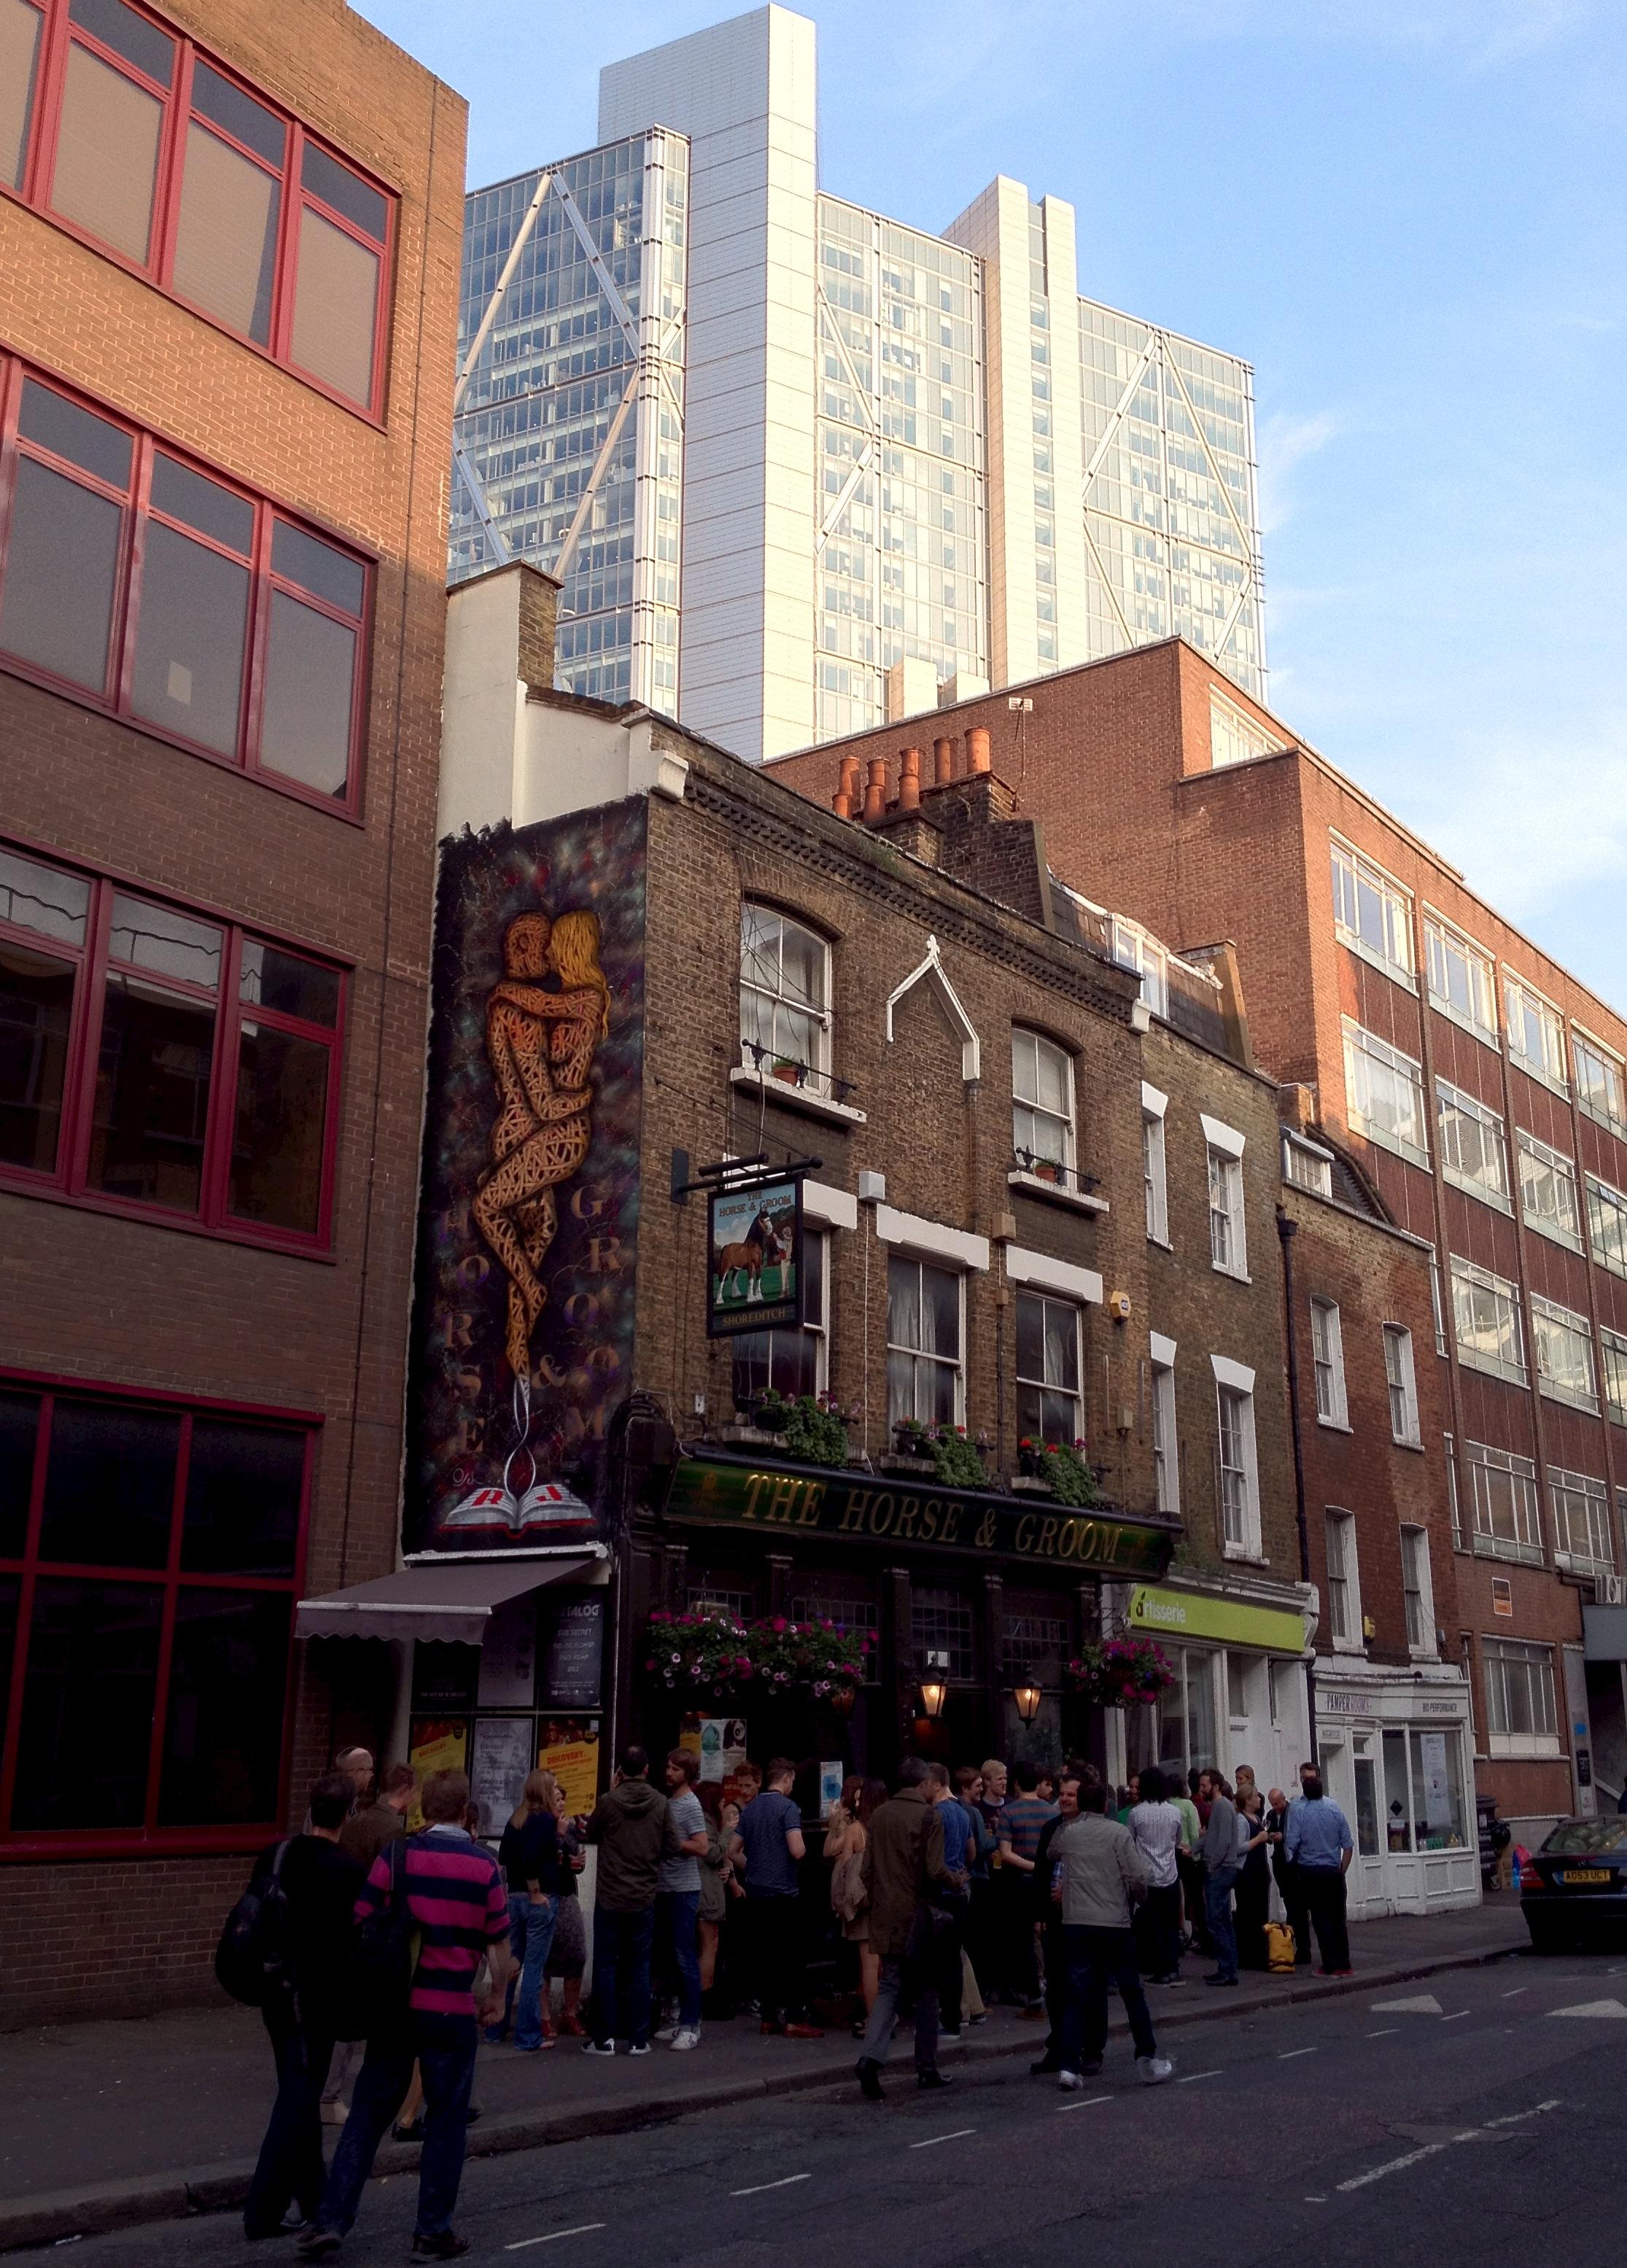 Shoreditch London: London Pub Crawls